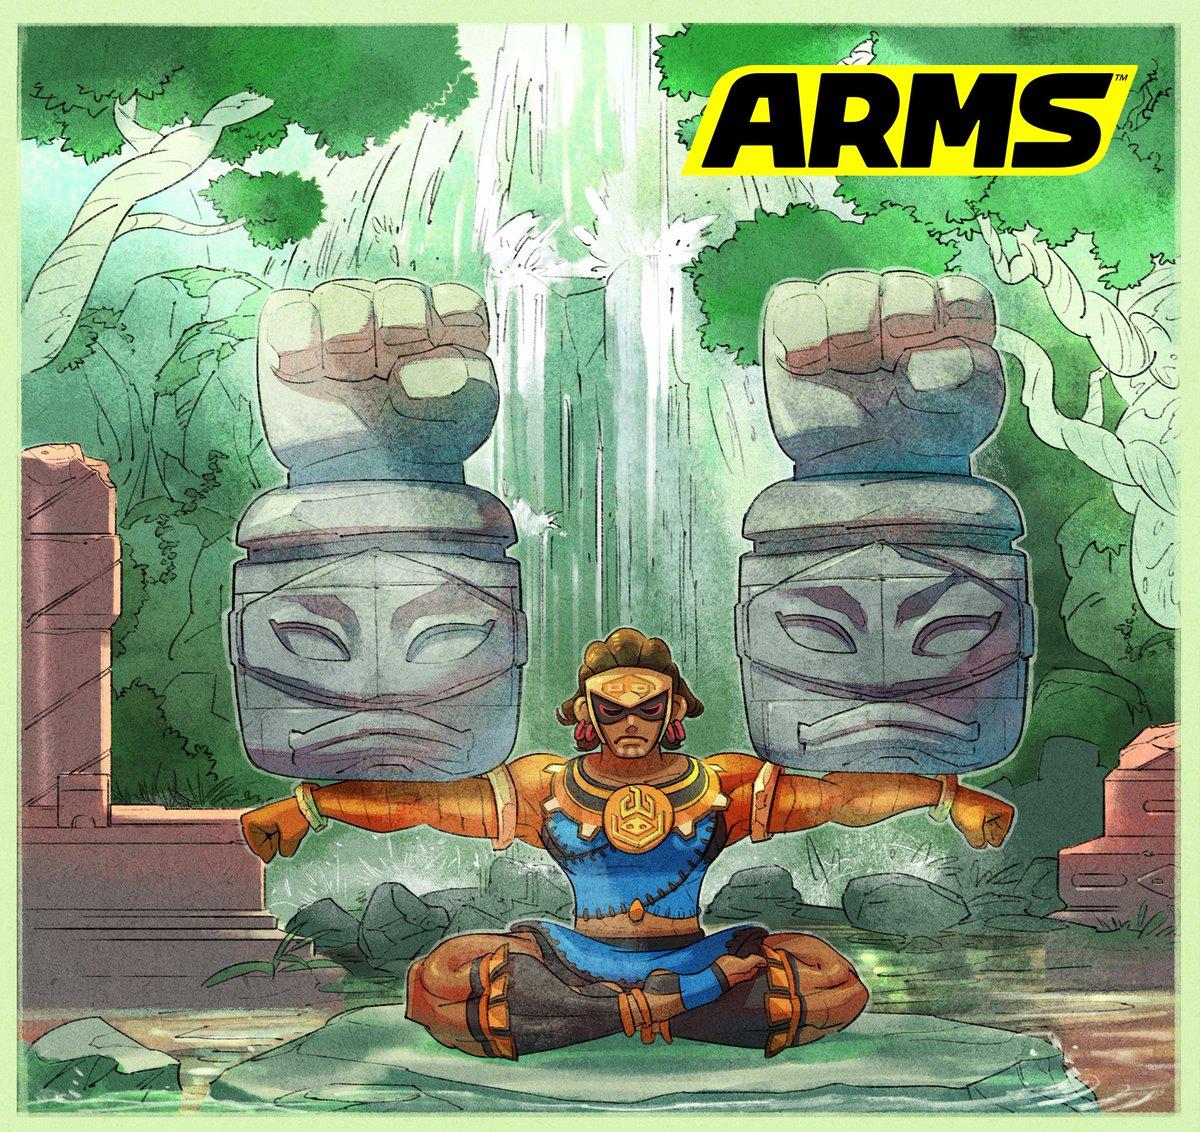 『ARMS』の更新データVer.4.0.0が11月16日から配信開始!